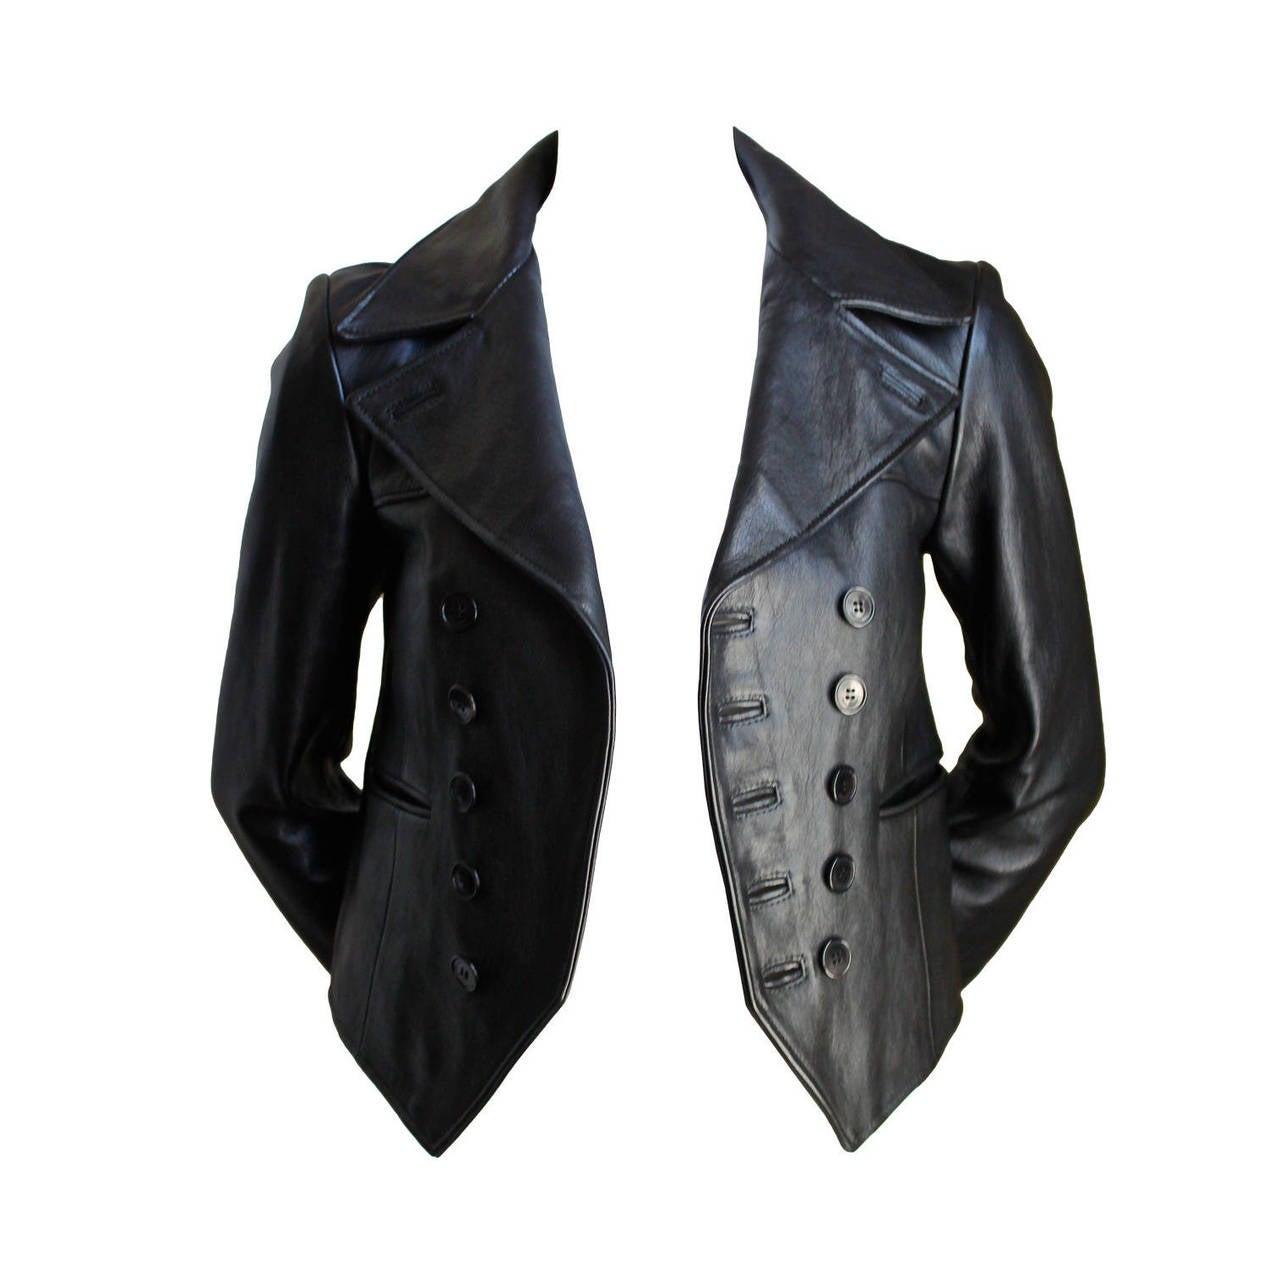 HEDI SLIMANE for SAINT LAURENT  black leather runway leather jacket - NEW 1